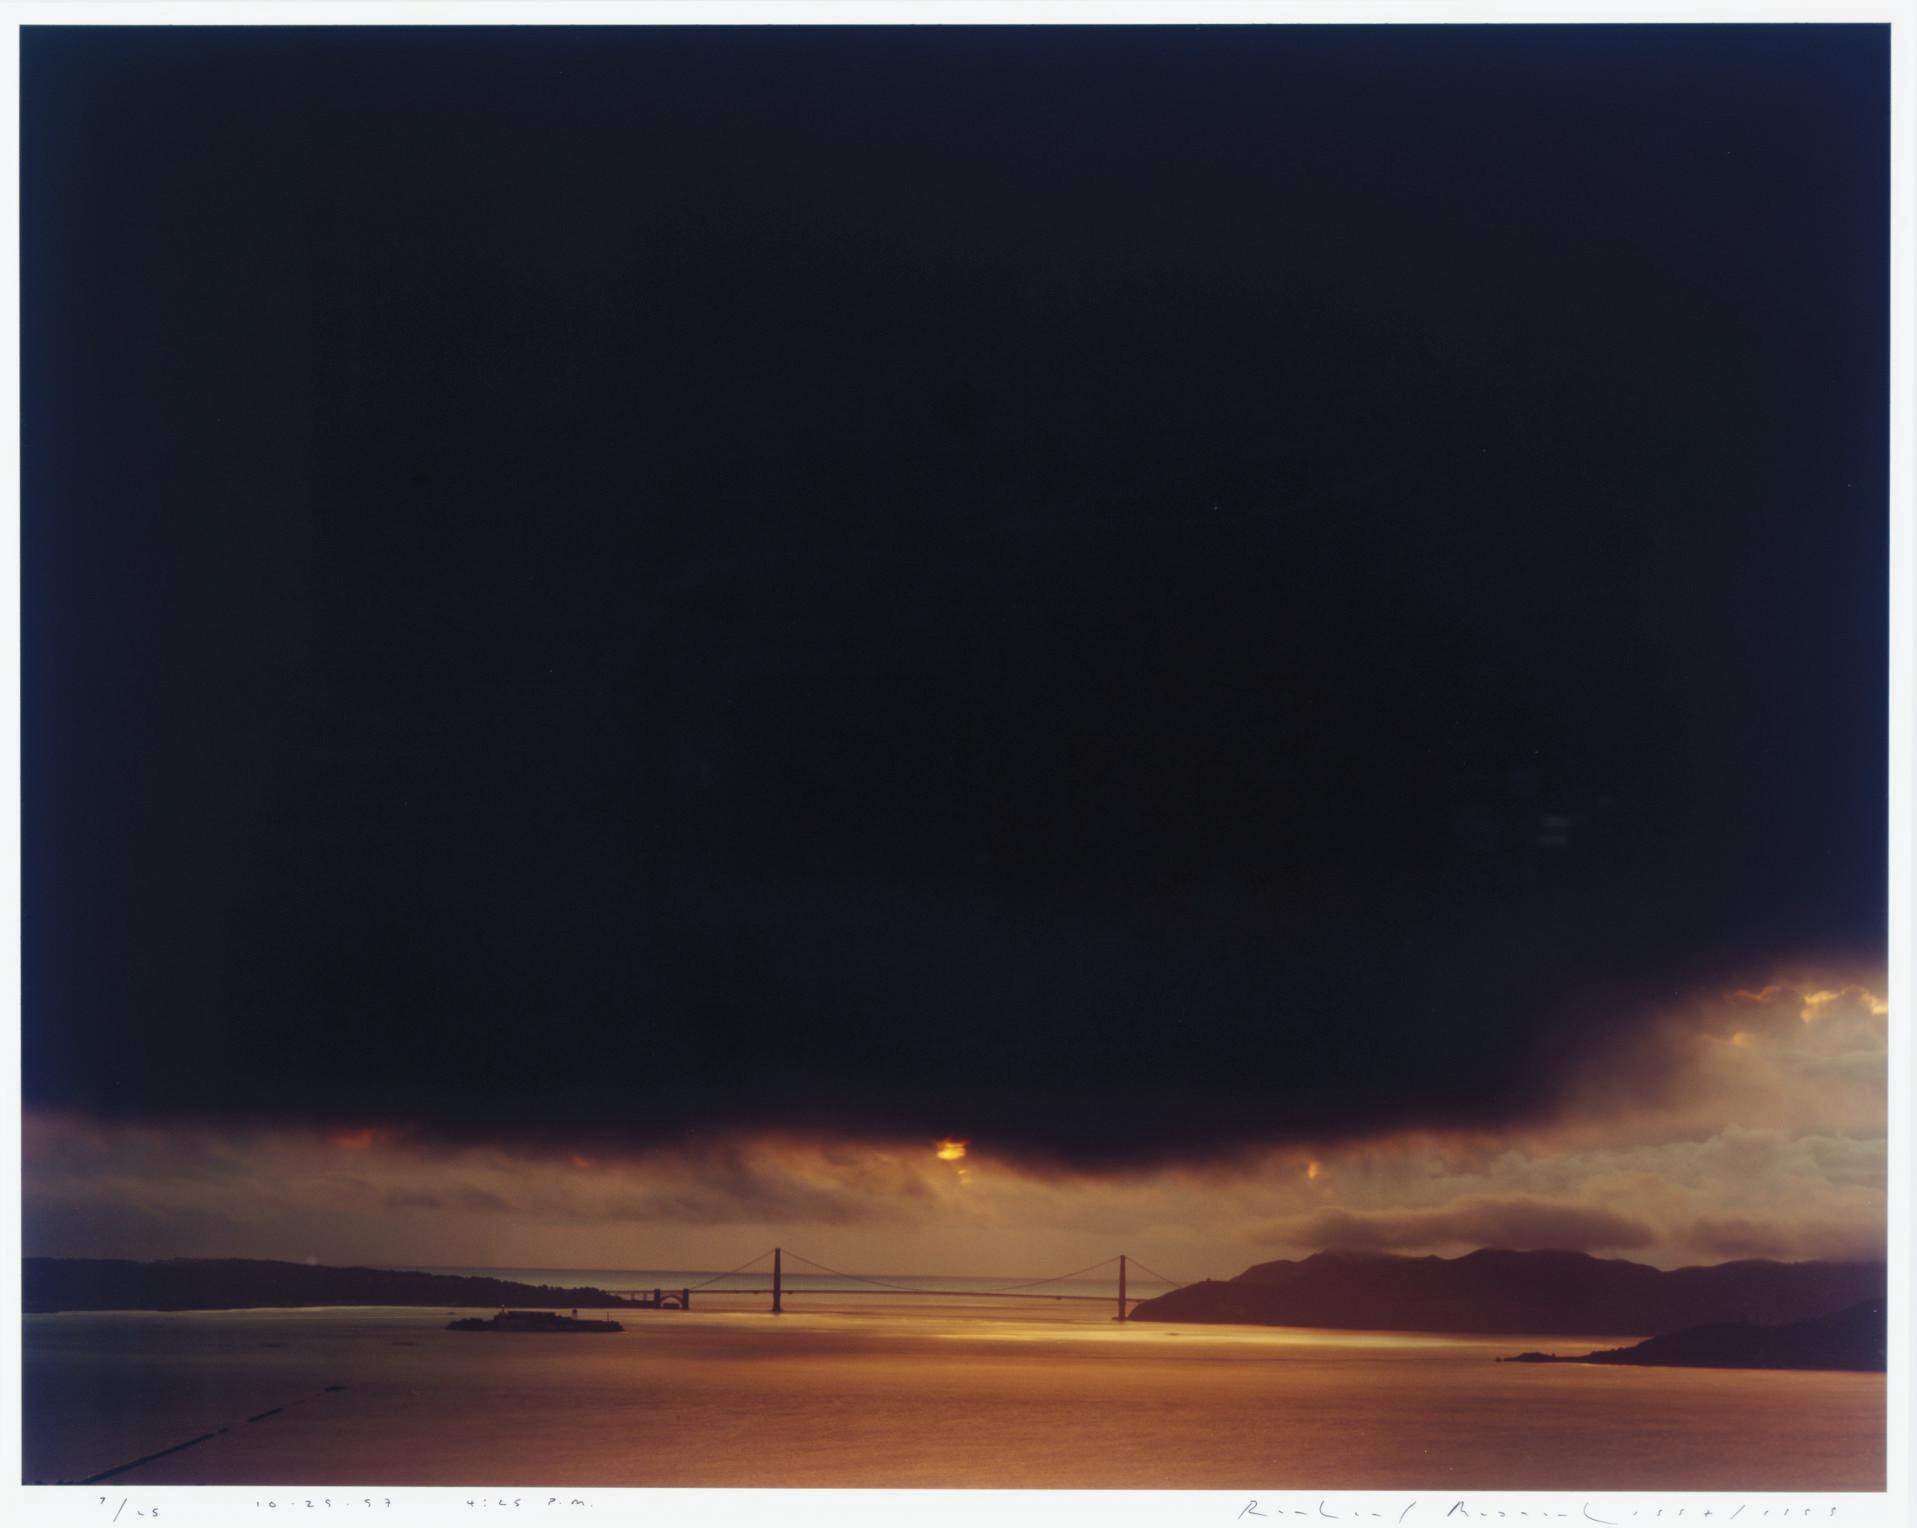 RICHARD MISRACH (B  1949) | Golden Gate Bridge, 10 29 97, 4